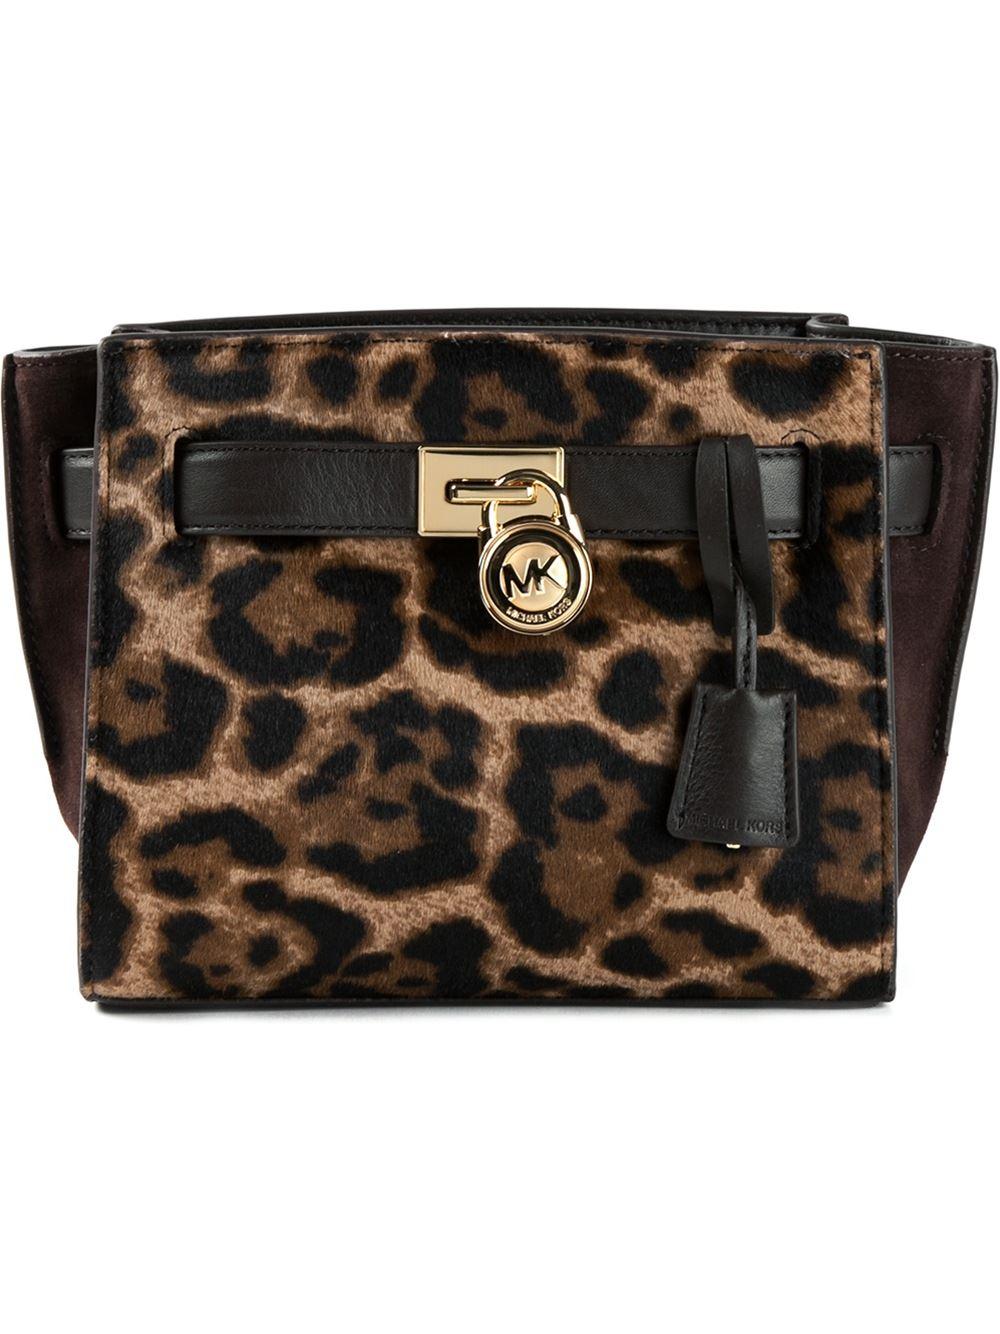 Hamilton Traveler Leopard Print Messenger Bag